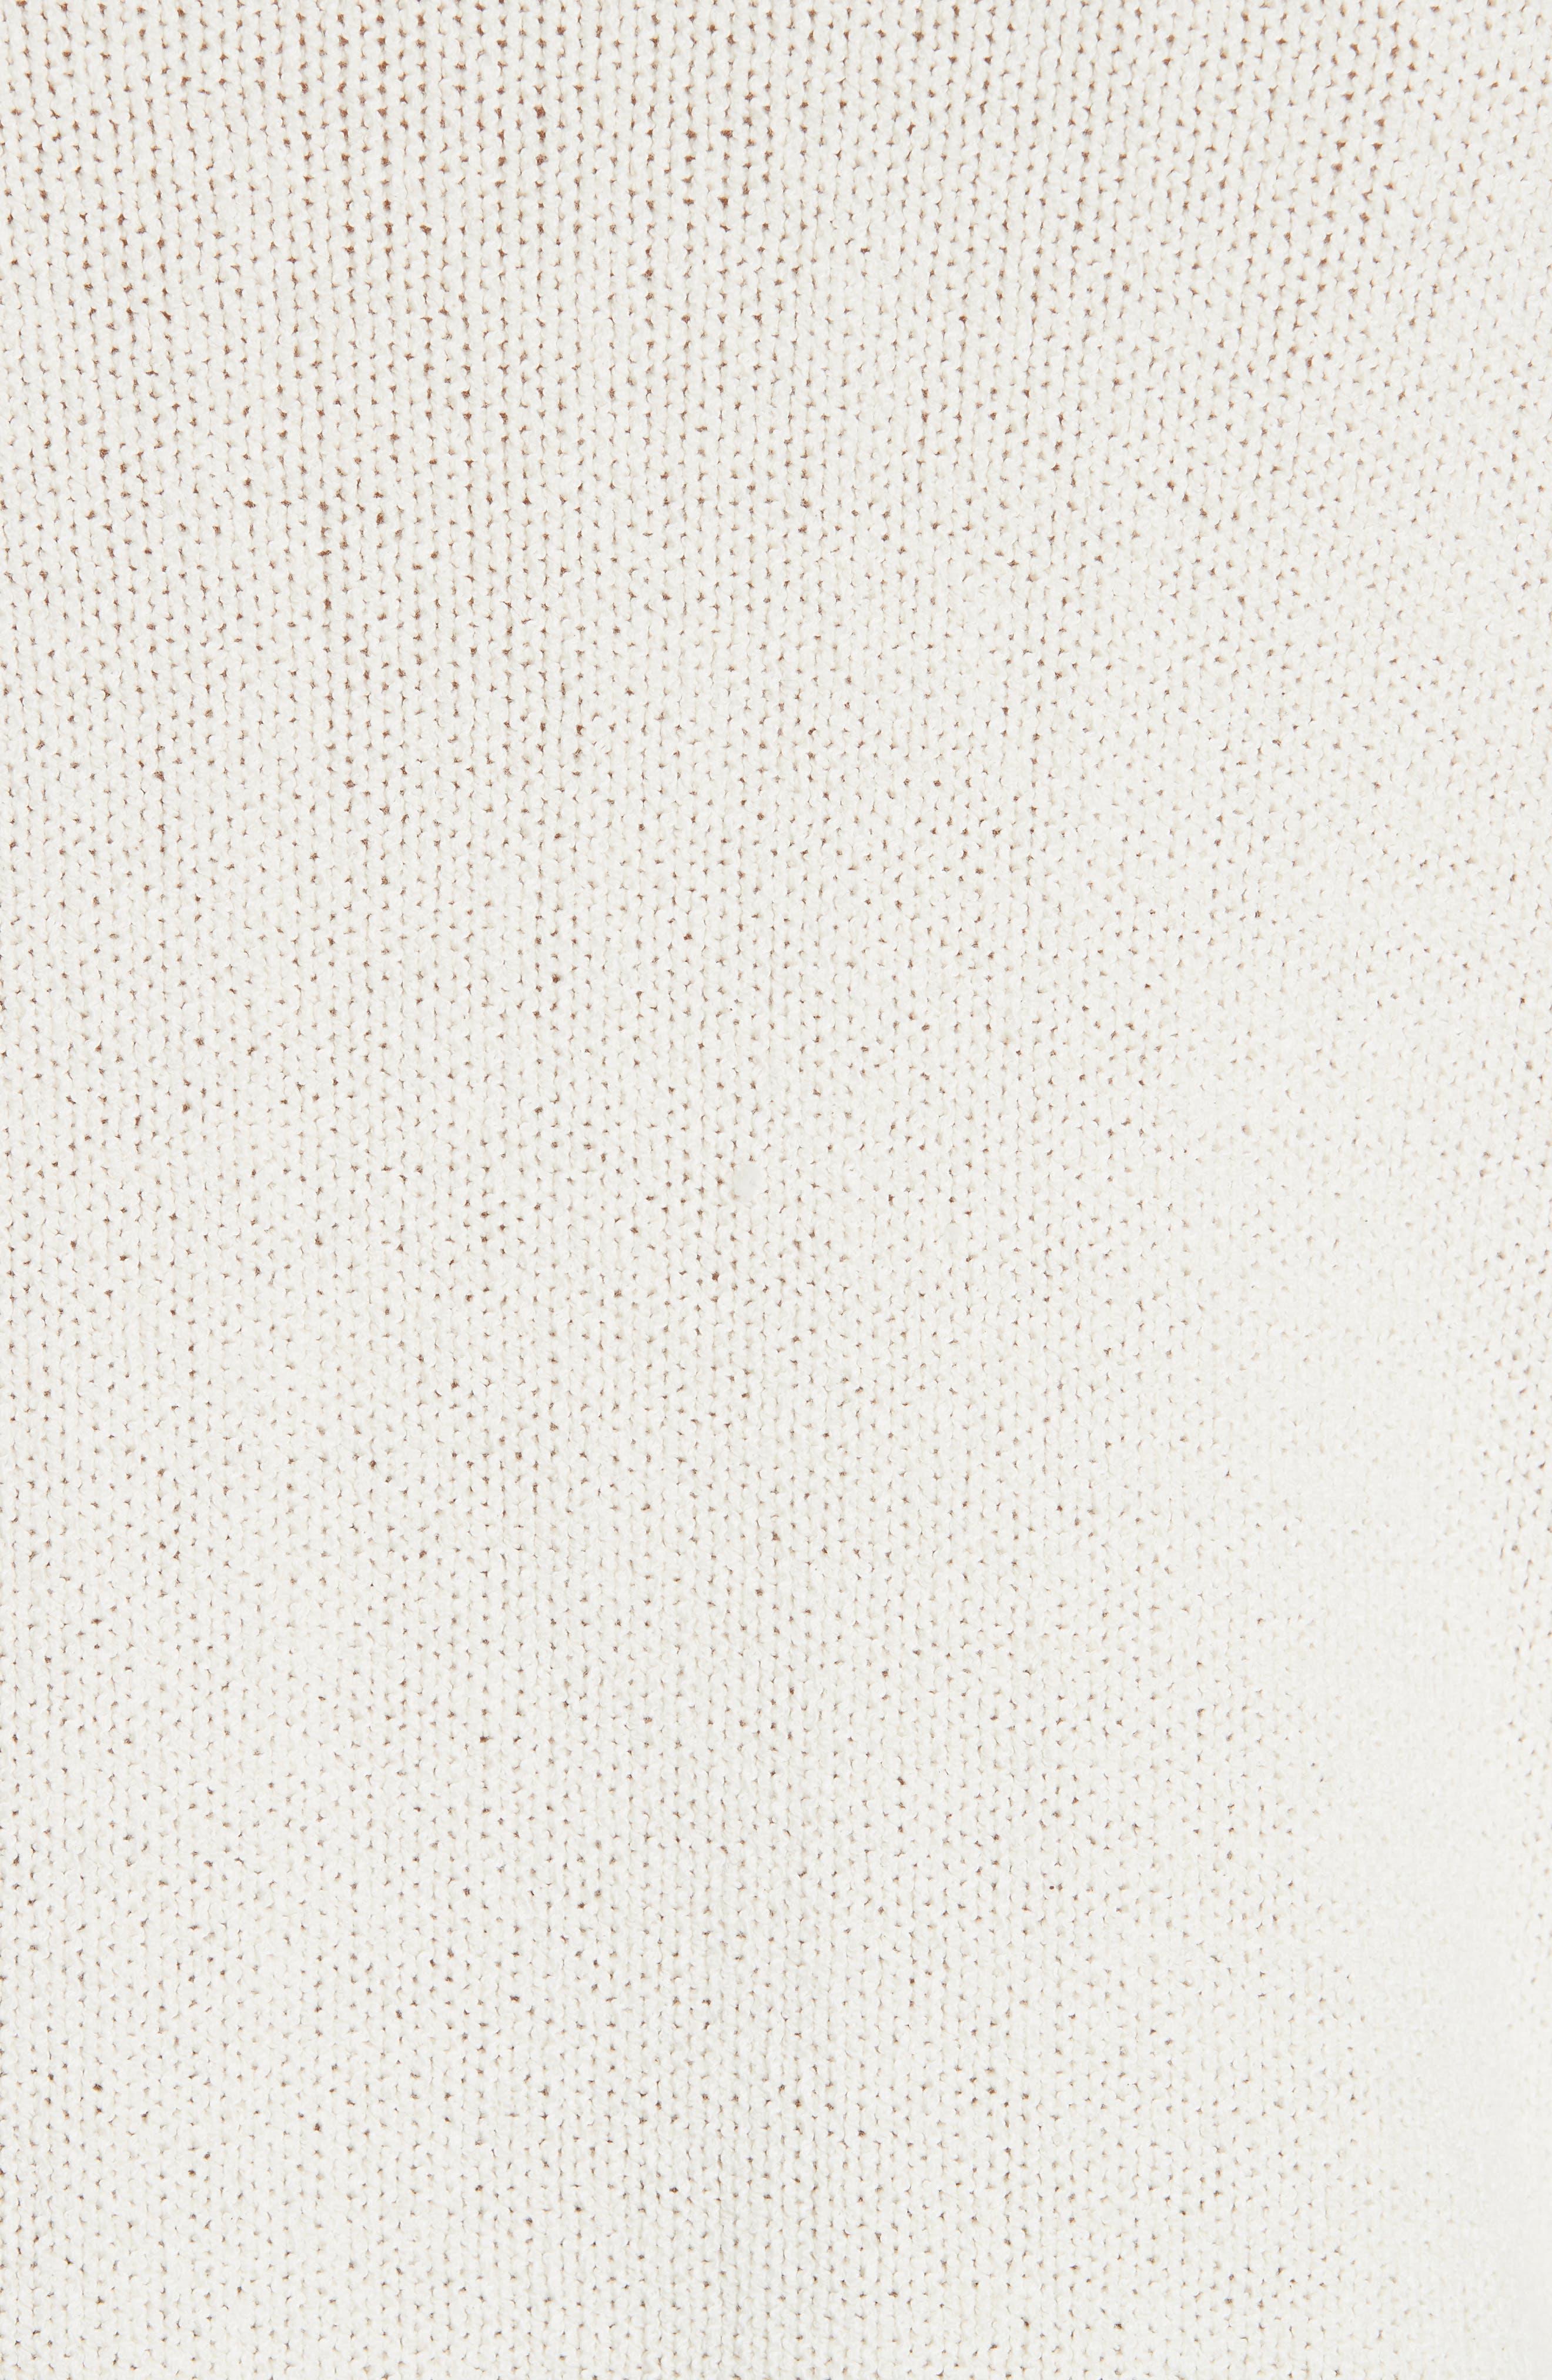 Somar Oversized Crewneck Sweater,                             Alternate thumbnail 5, color,                             100